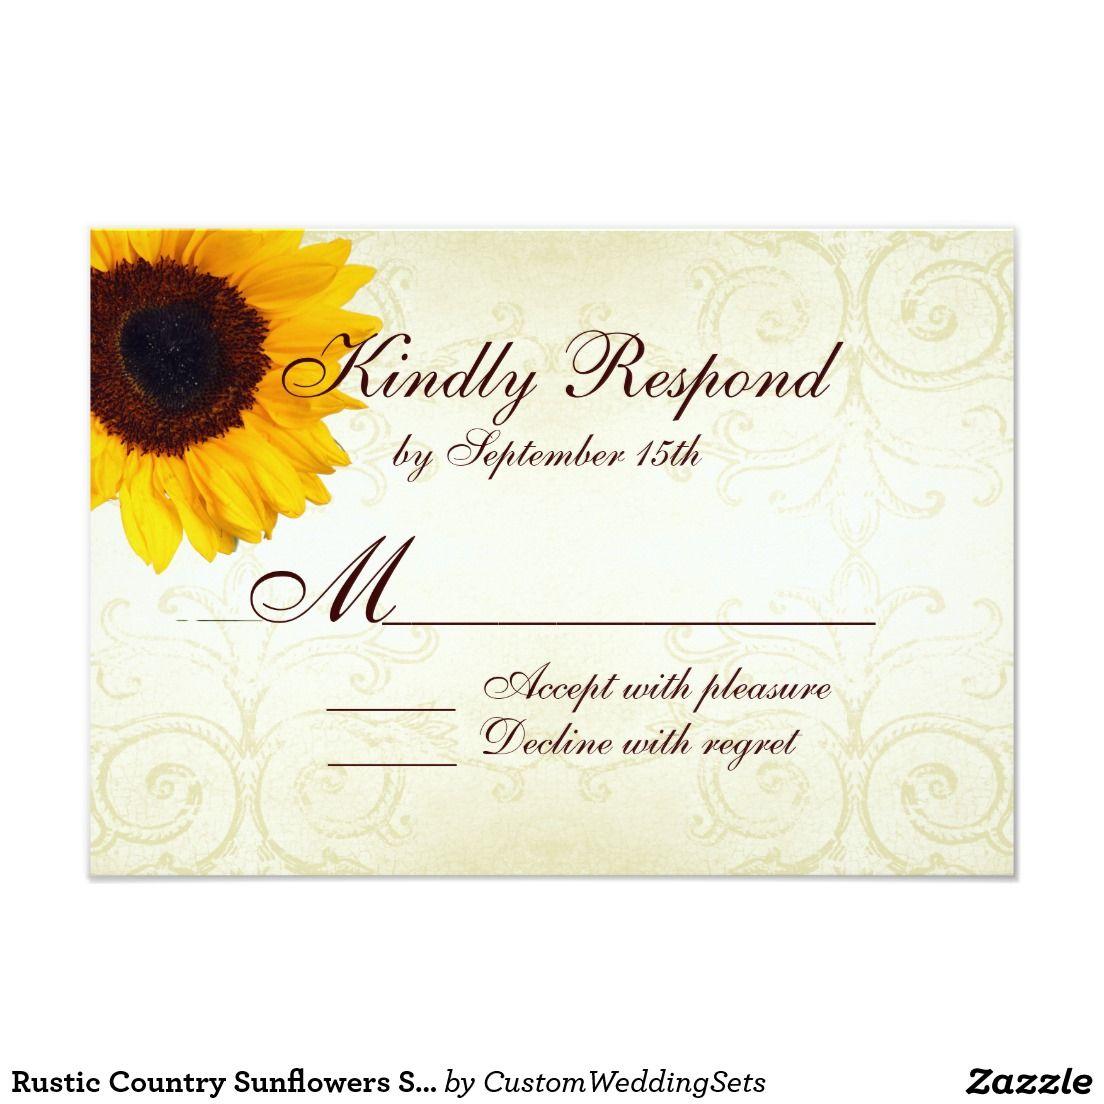 Rustic Country Sunflowers Swirls Wedding RSVP Card